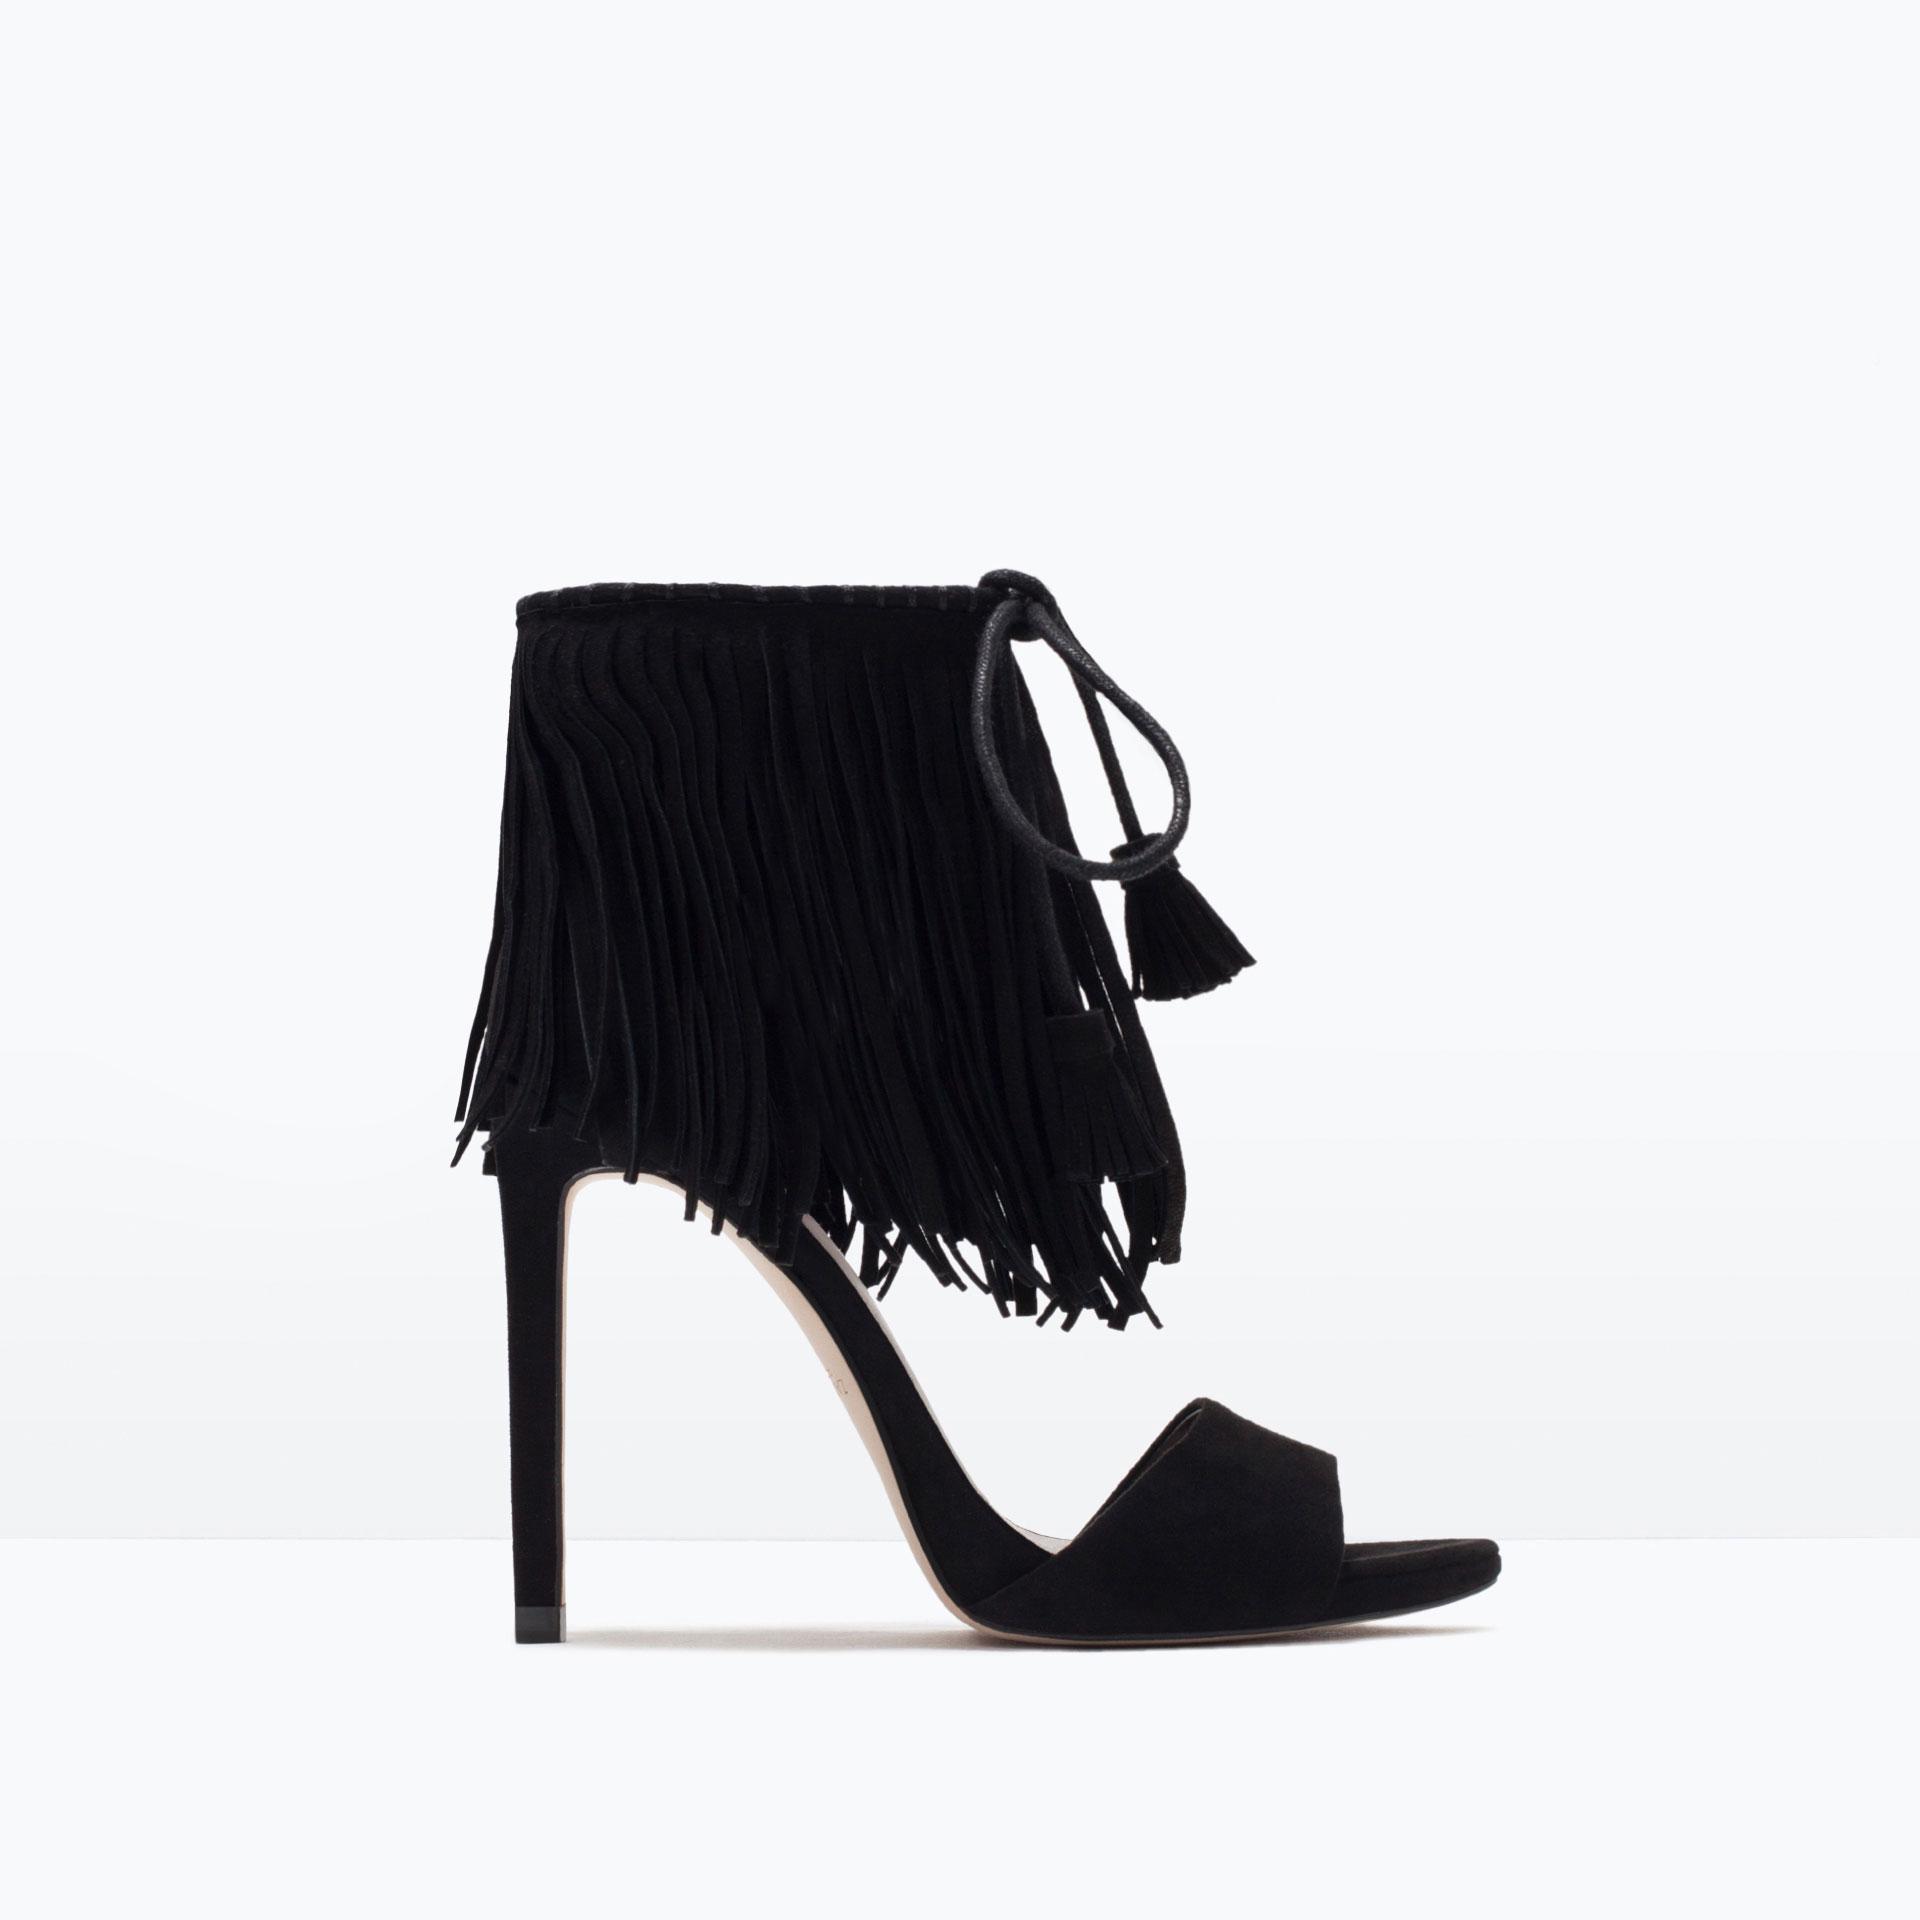 9f79ed3e2c7 FRINGED HIGH HEEL SANDALS - High - heels - Shoes - WOMAN ...